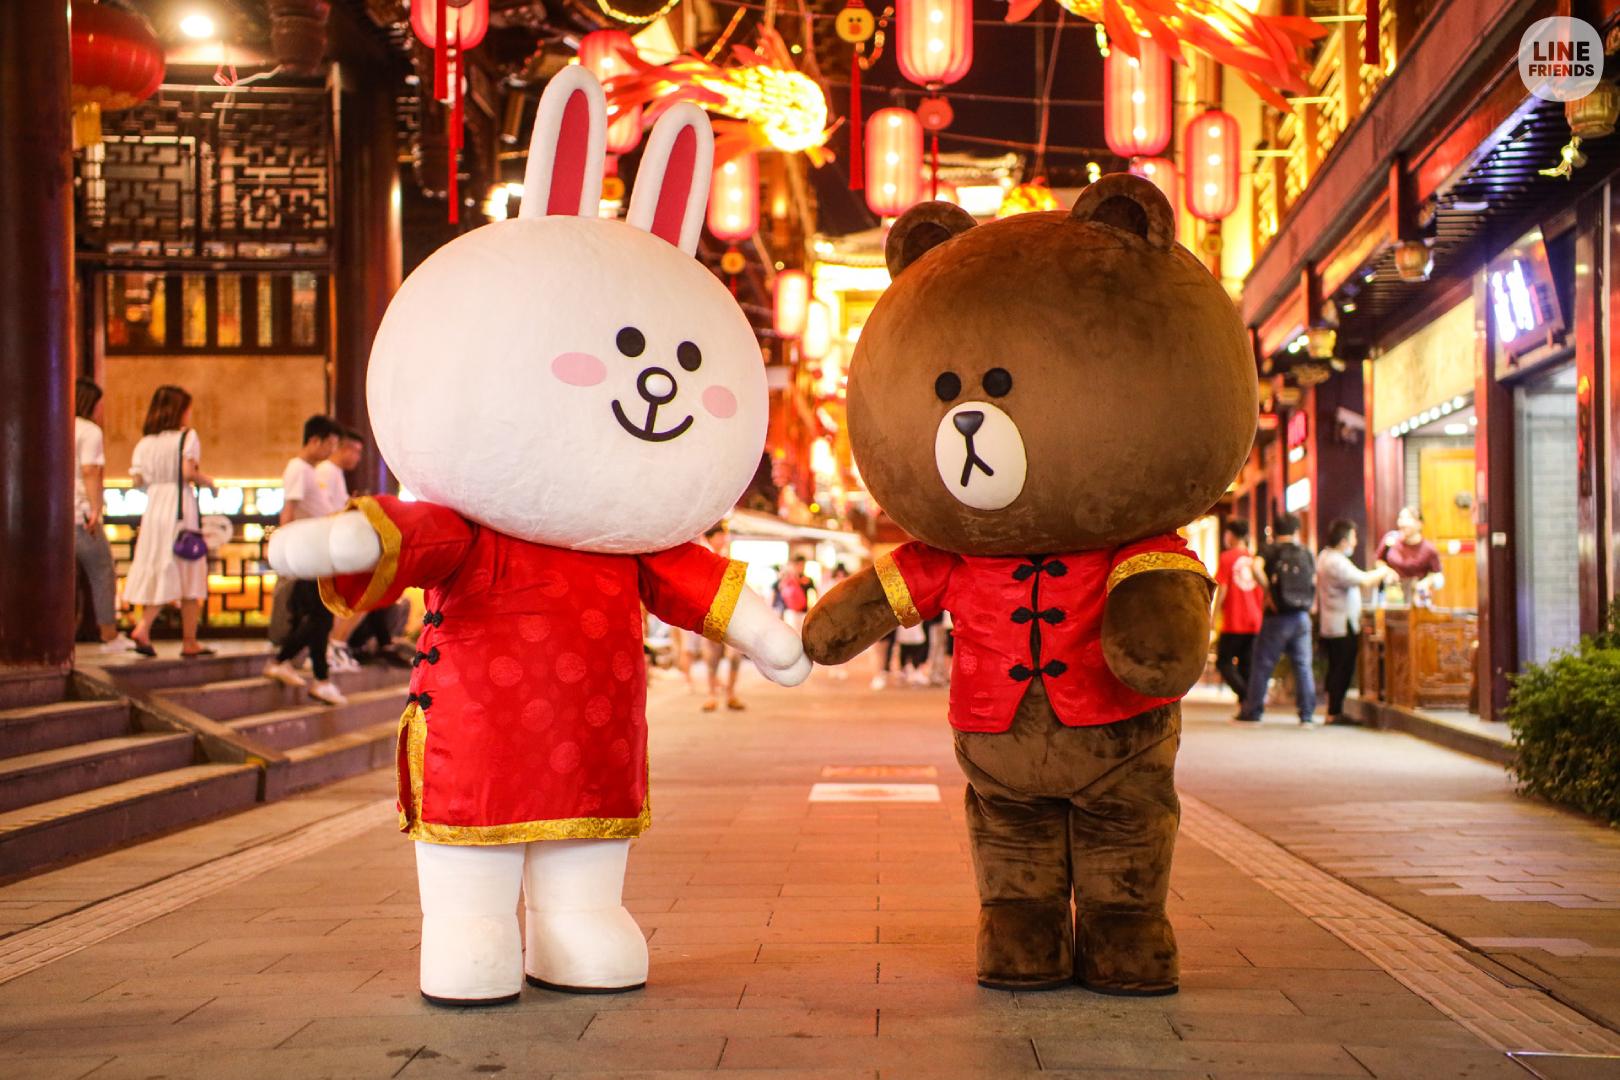 LINE FRIENDS与豫园商城携手呈现七夕情人节庙会活动展现文化交融,时代碰撞之美